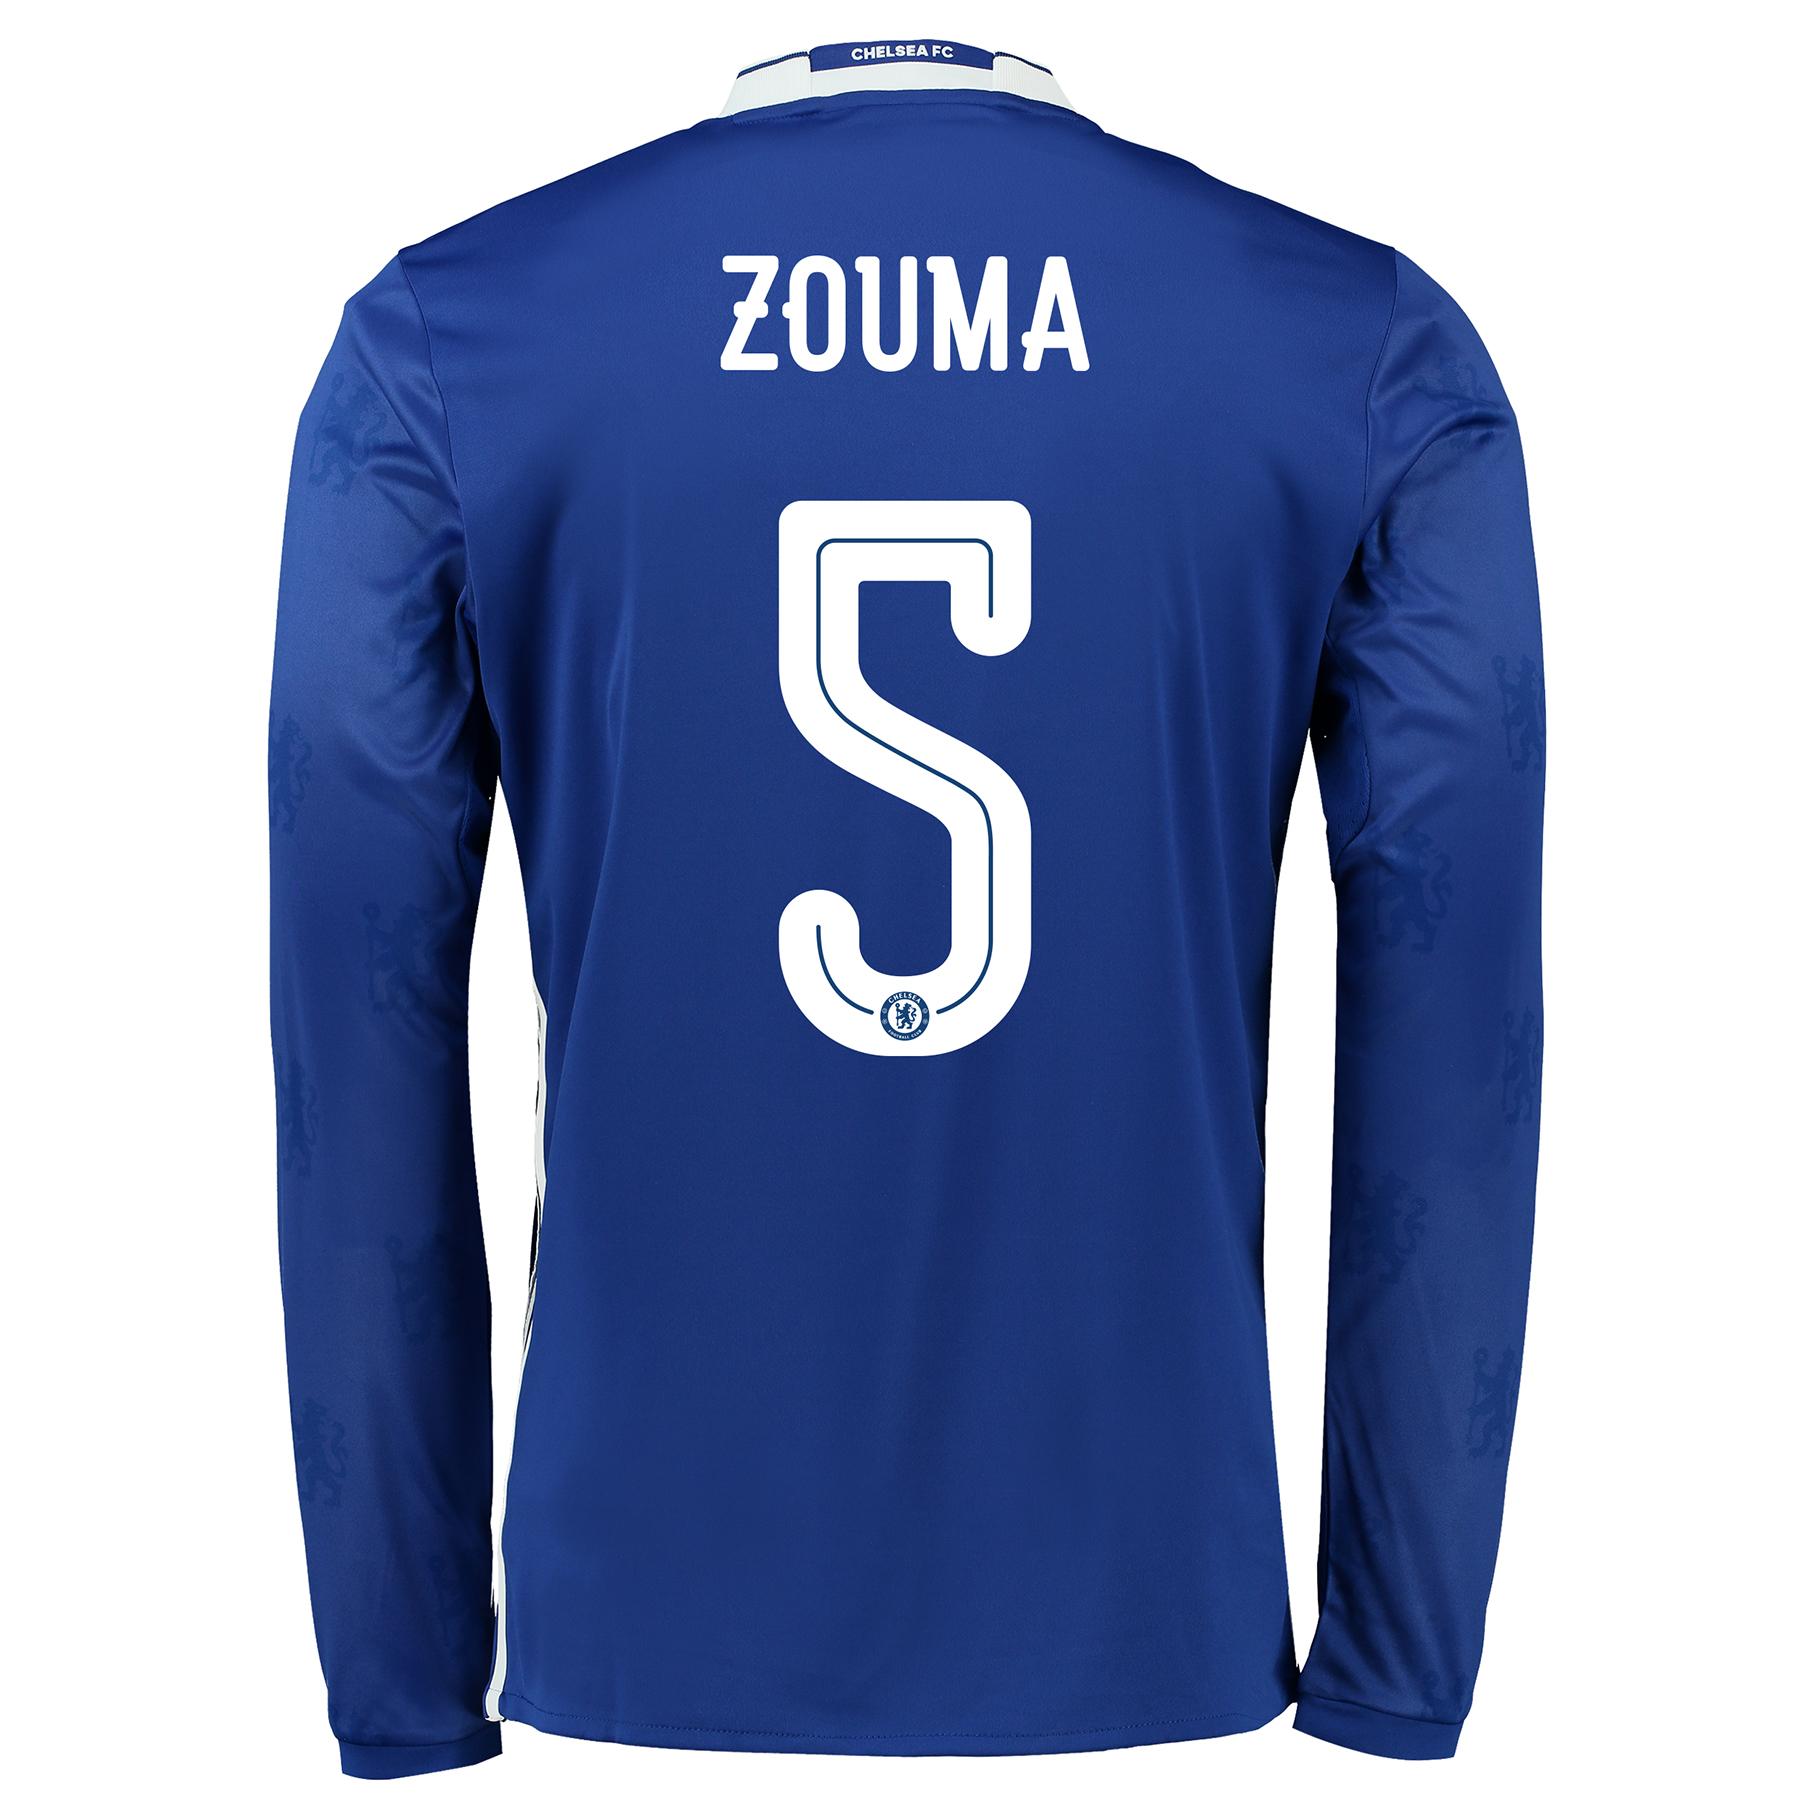 Chelsea Linear Home Shirt 2016-17 - Long Sleeve with ZOUMA 5 printing